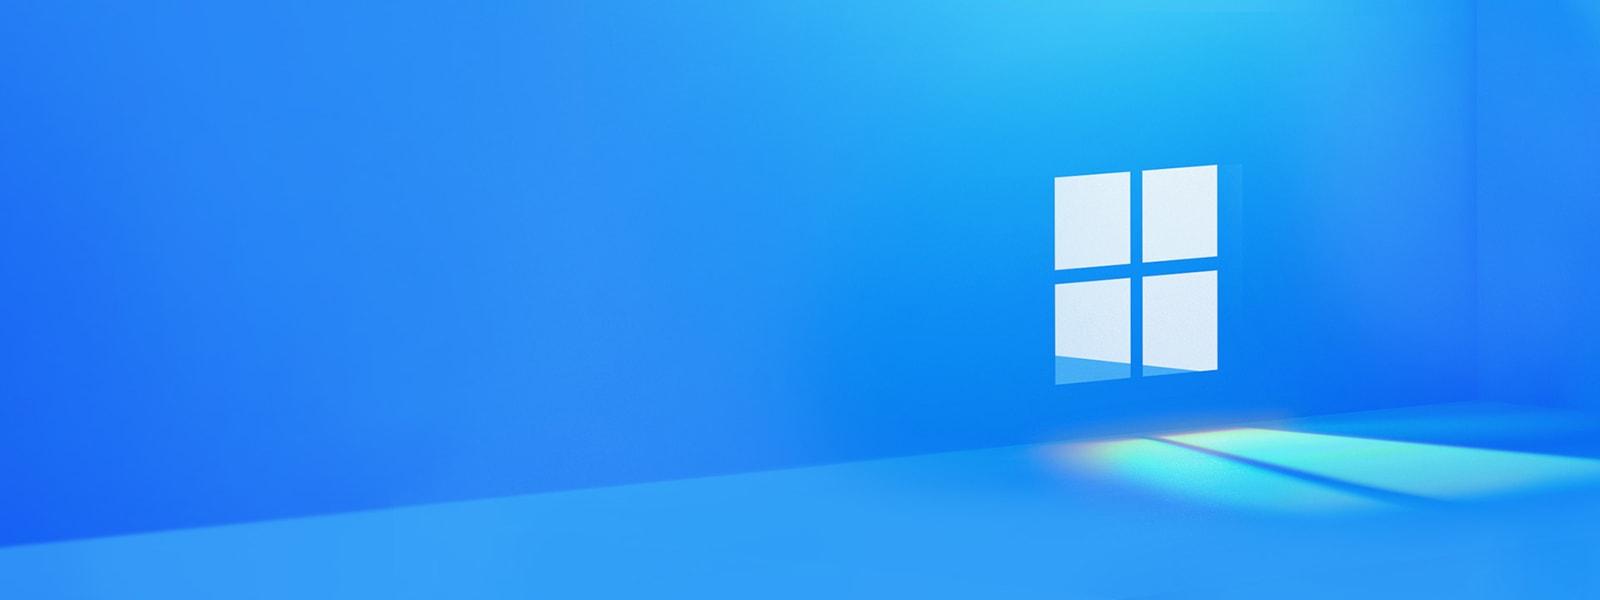 Microsoft Windows logo set inside a wall with light shining through